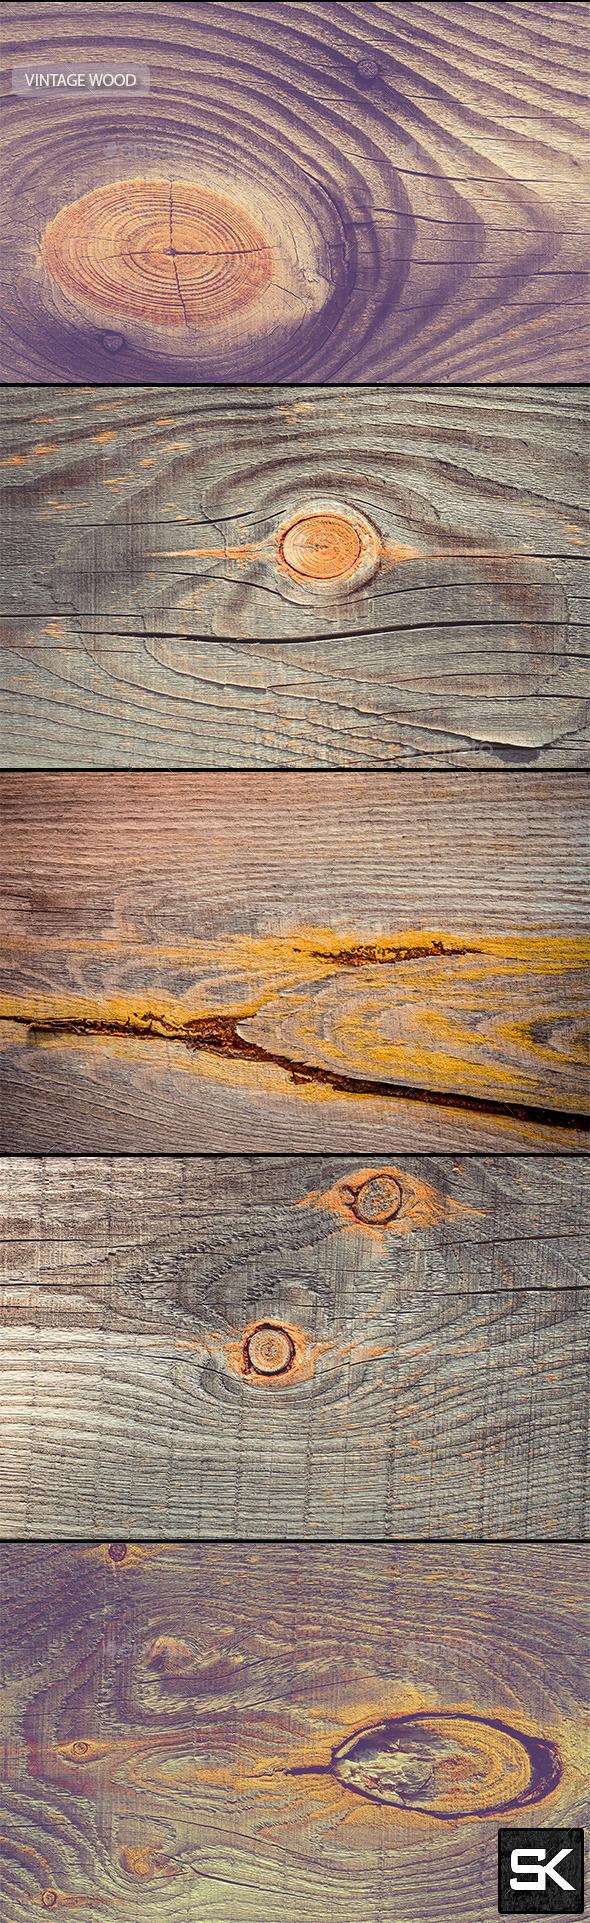 Wood Texture.3 - Wood Textures